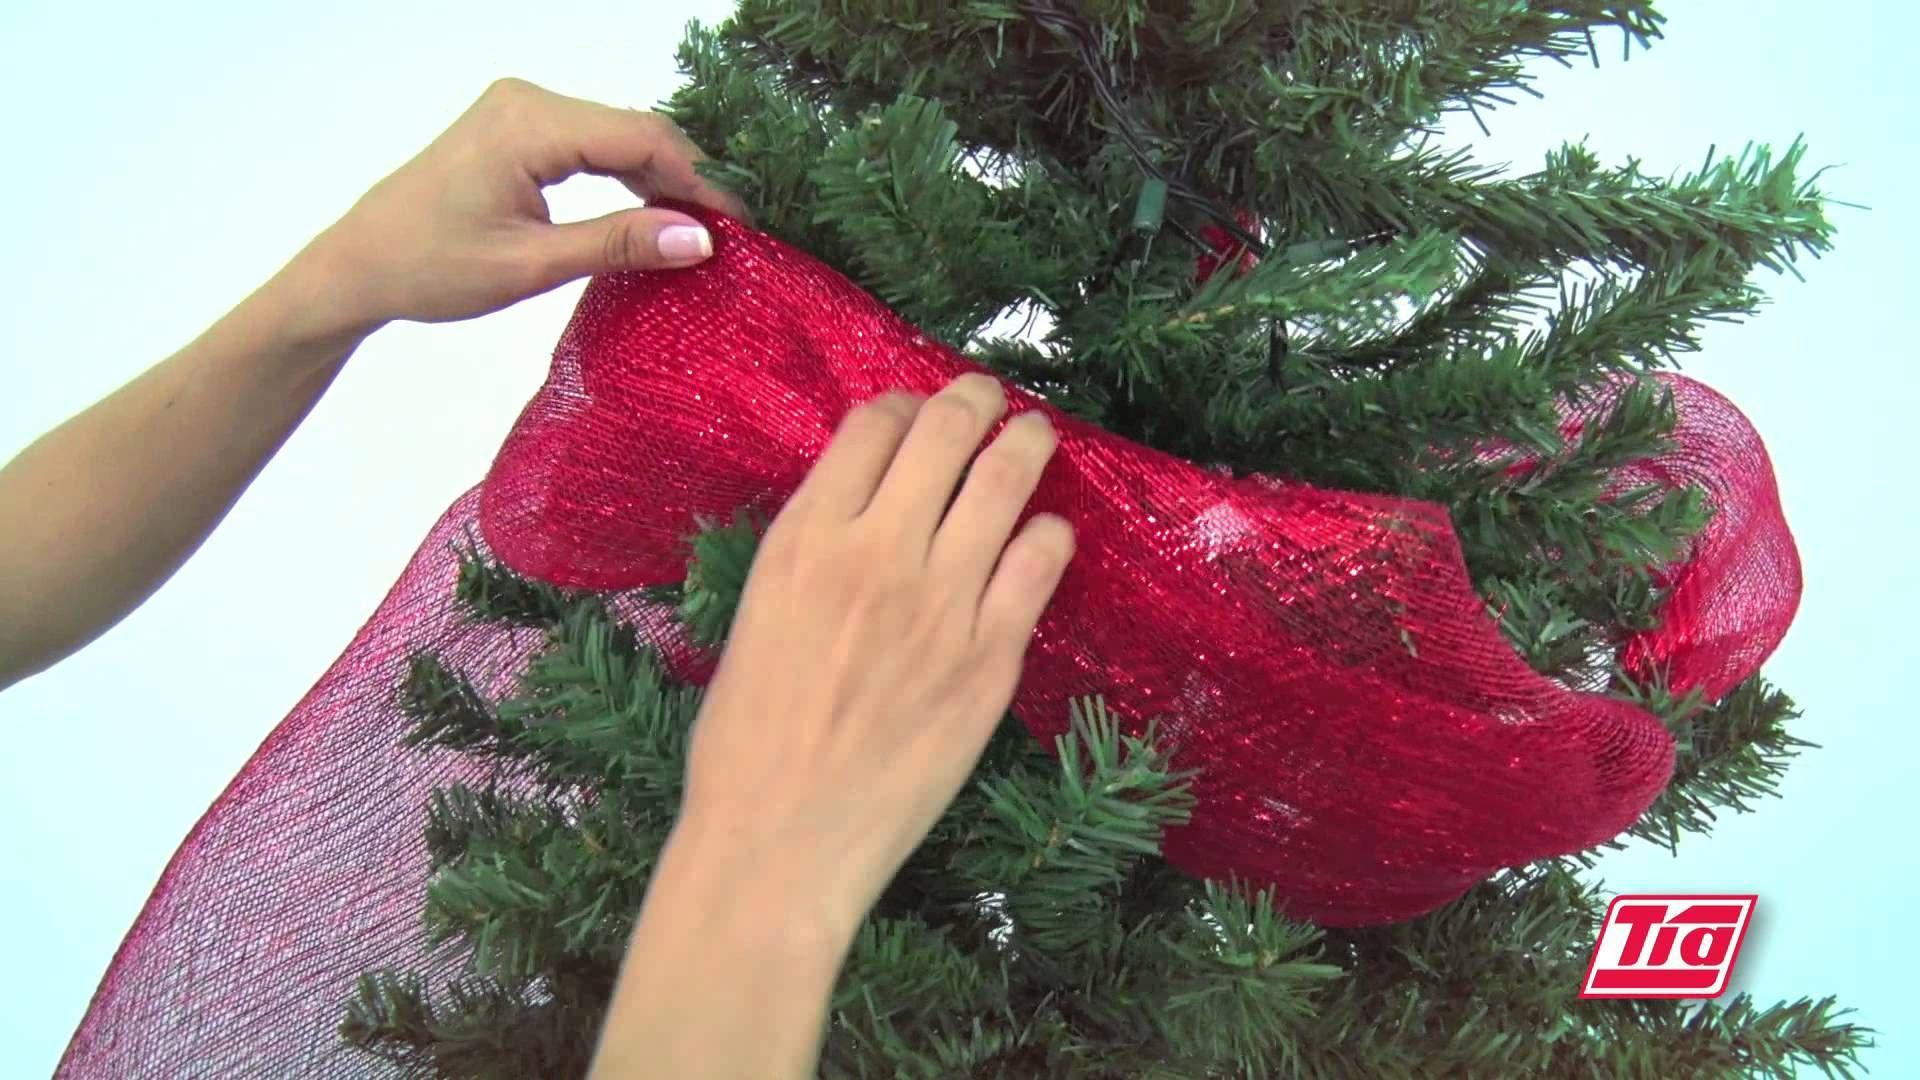 Todo Es Mas Facil Con Tia Como Decorar Tu Arbol De Navidad Arbol De Navidad Malla Cinta De Arbol De Navidad Decoracion Arbol De Navidad